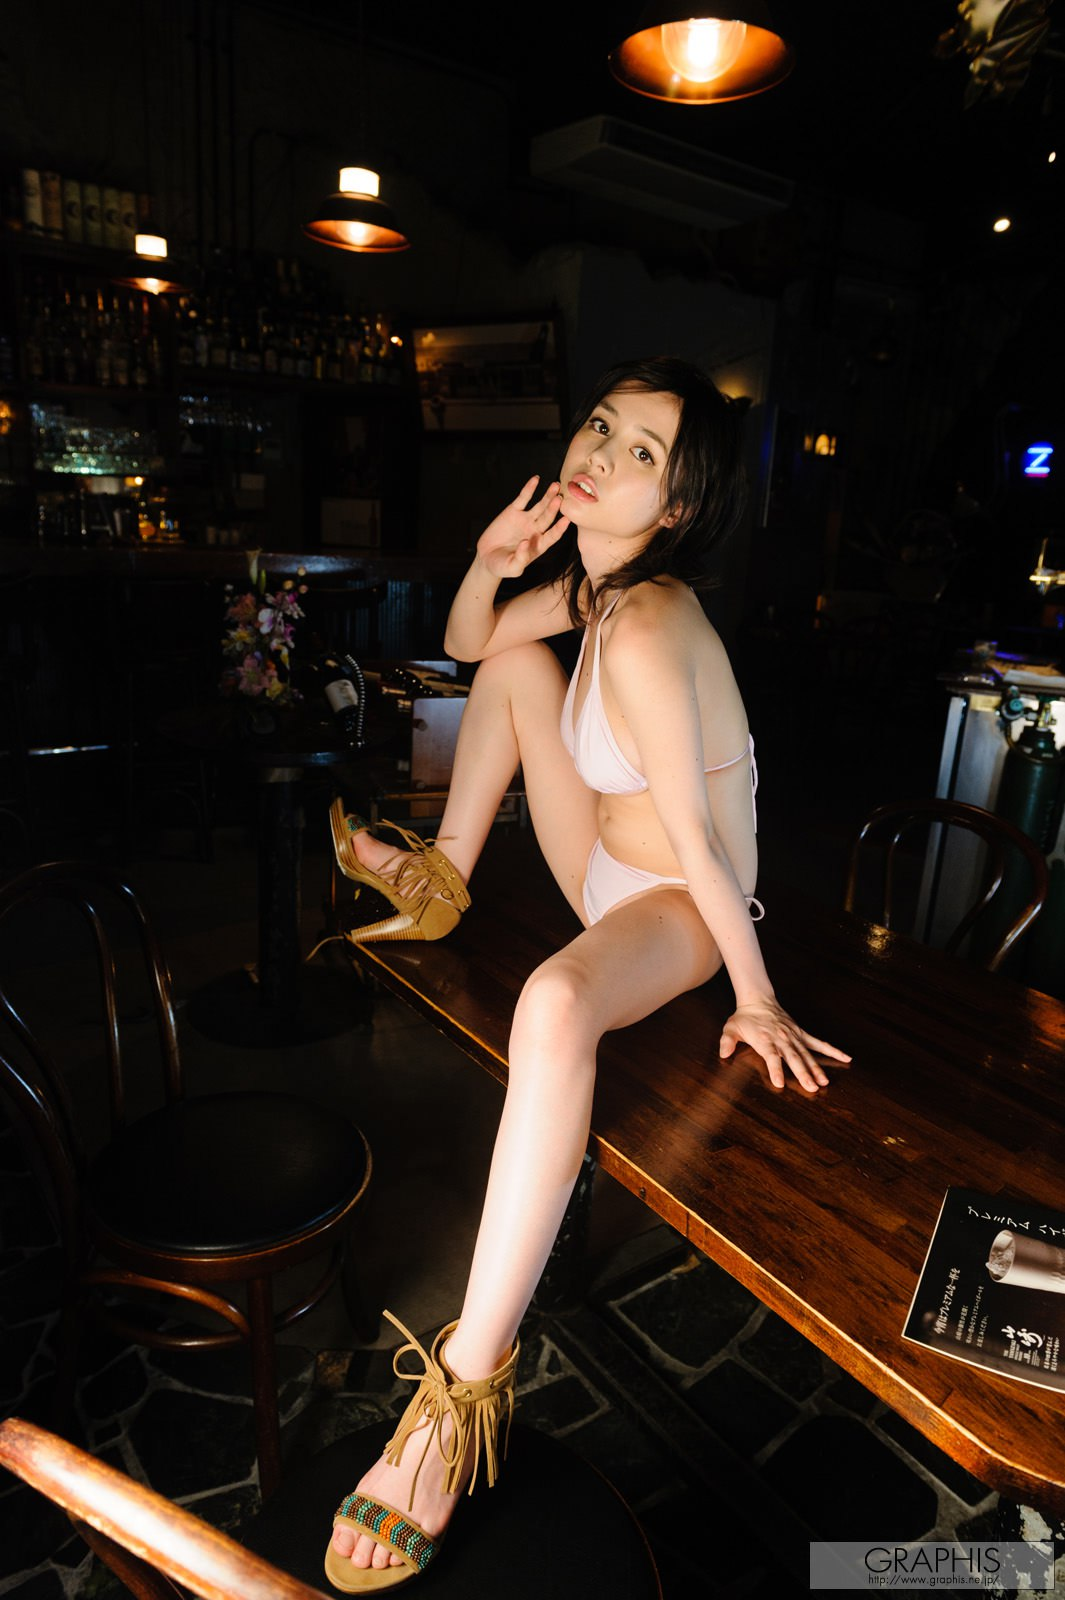 aimi-yoshikawa-boobs-naked-asian-bar-graphis-10